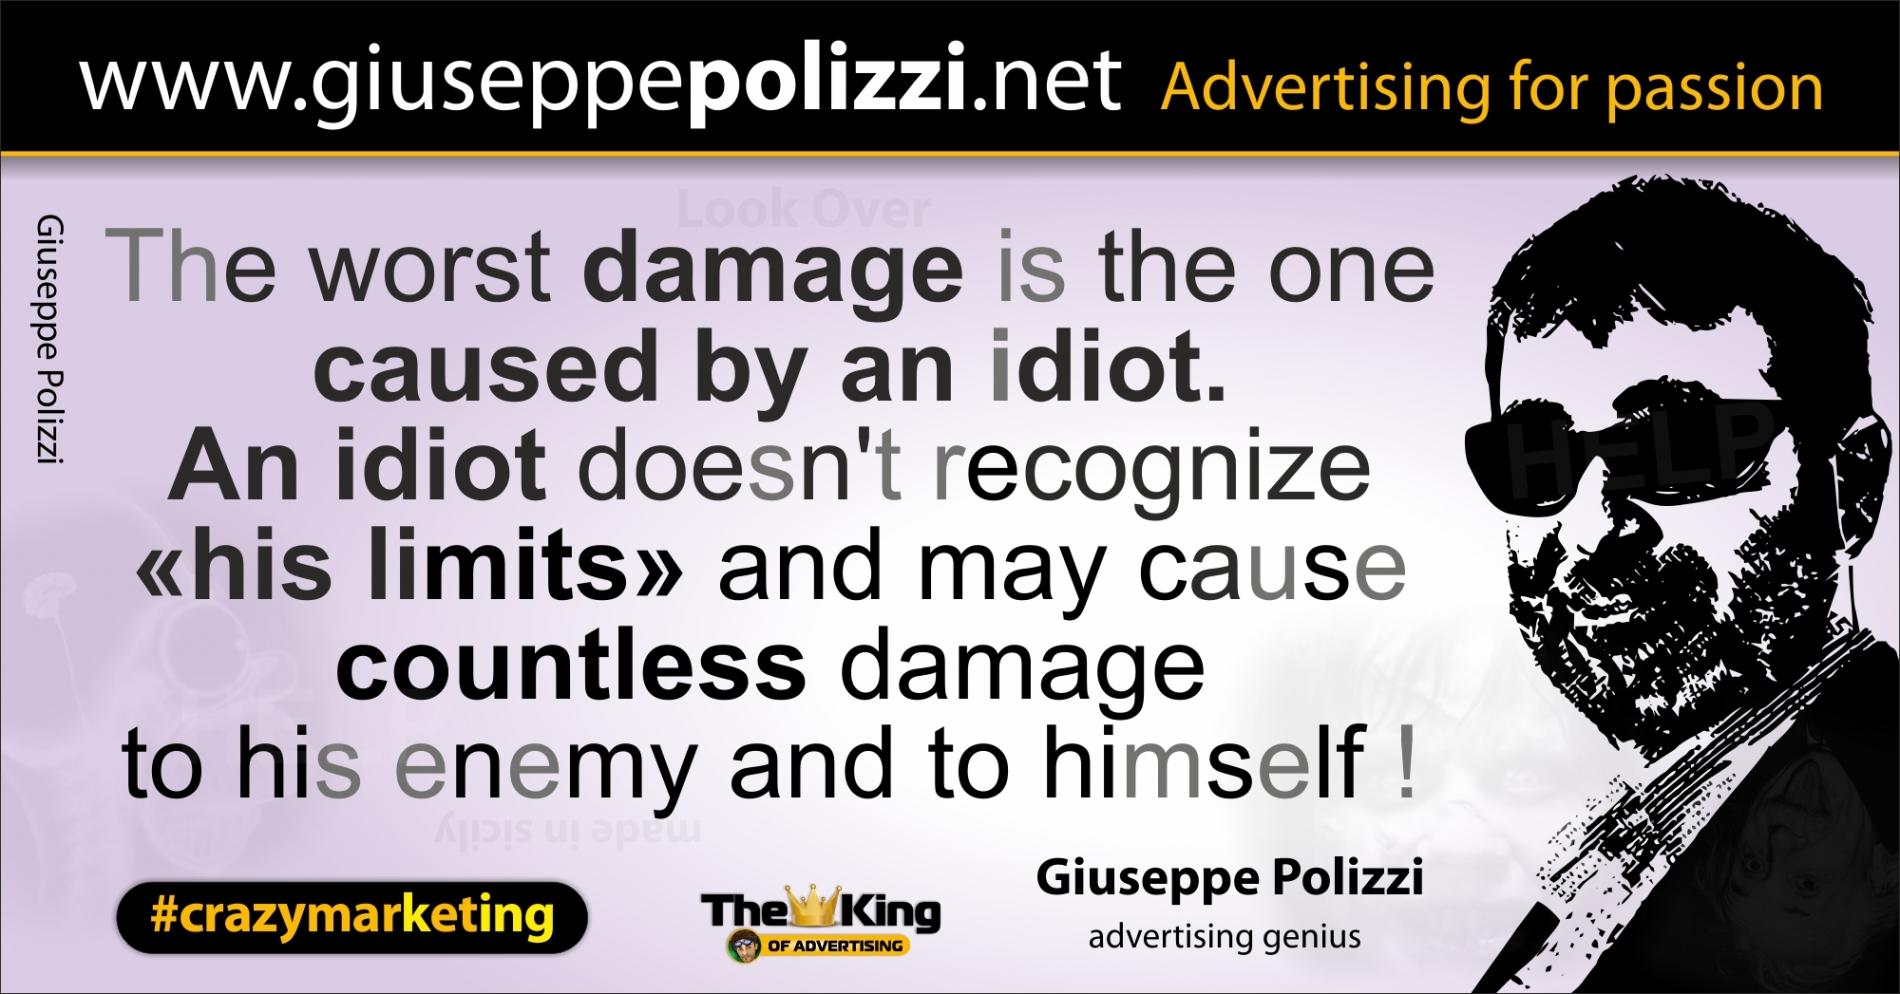 giuseppe polizzi aforismi cretino stupido 2016 crazymarketing (1)